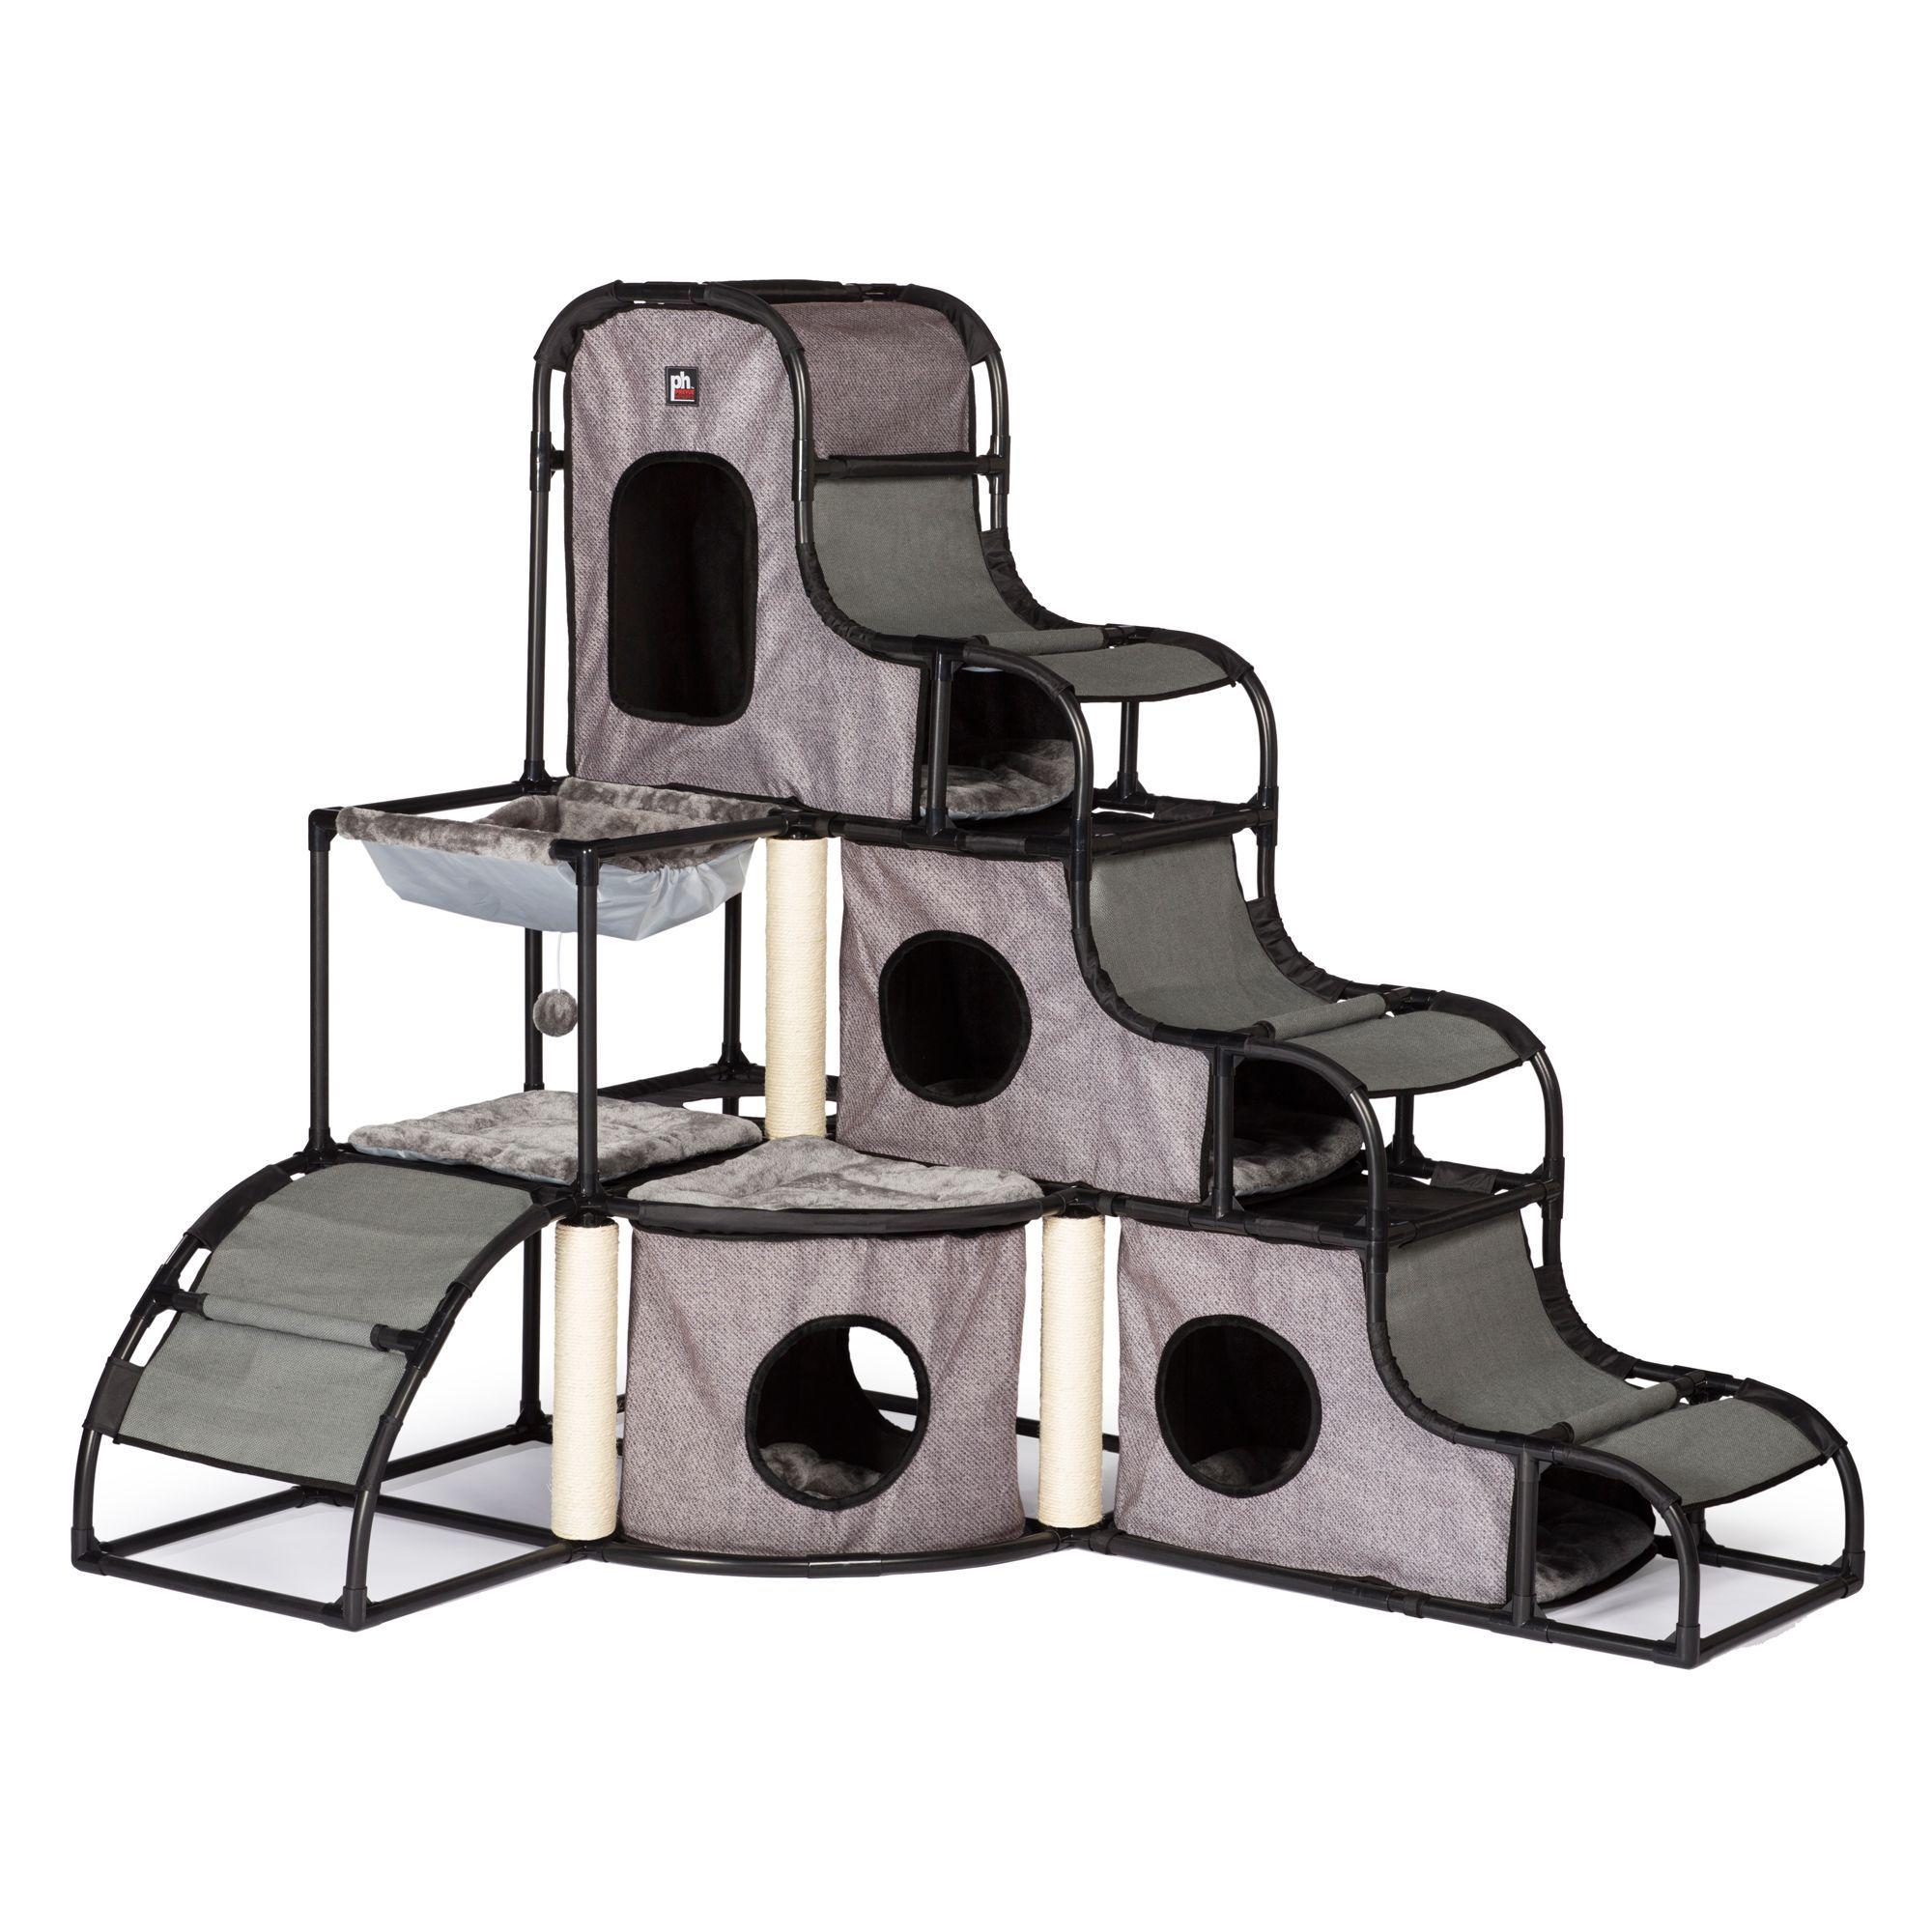 Prevue Pet Catville Cat Tower Cat Condo Cat Climbing Tower Cat Climbing